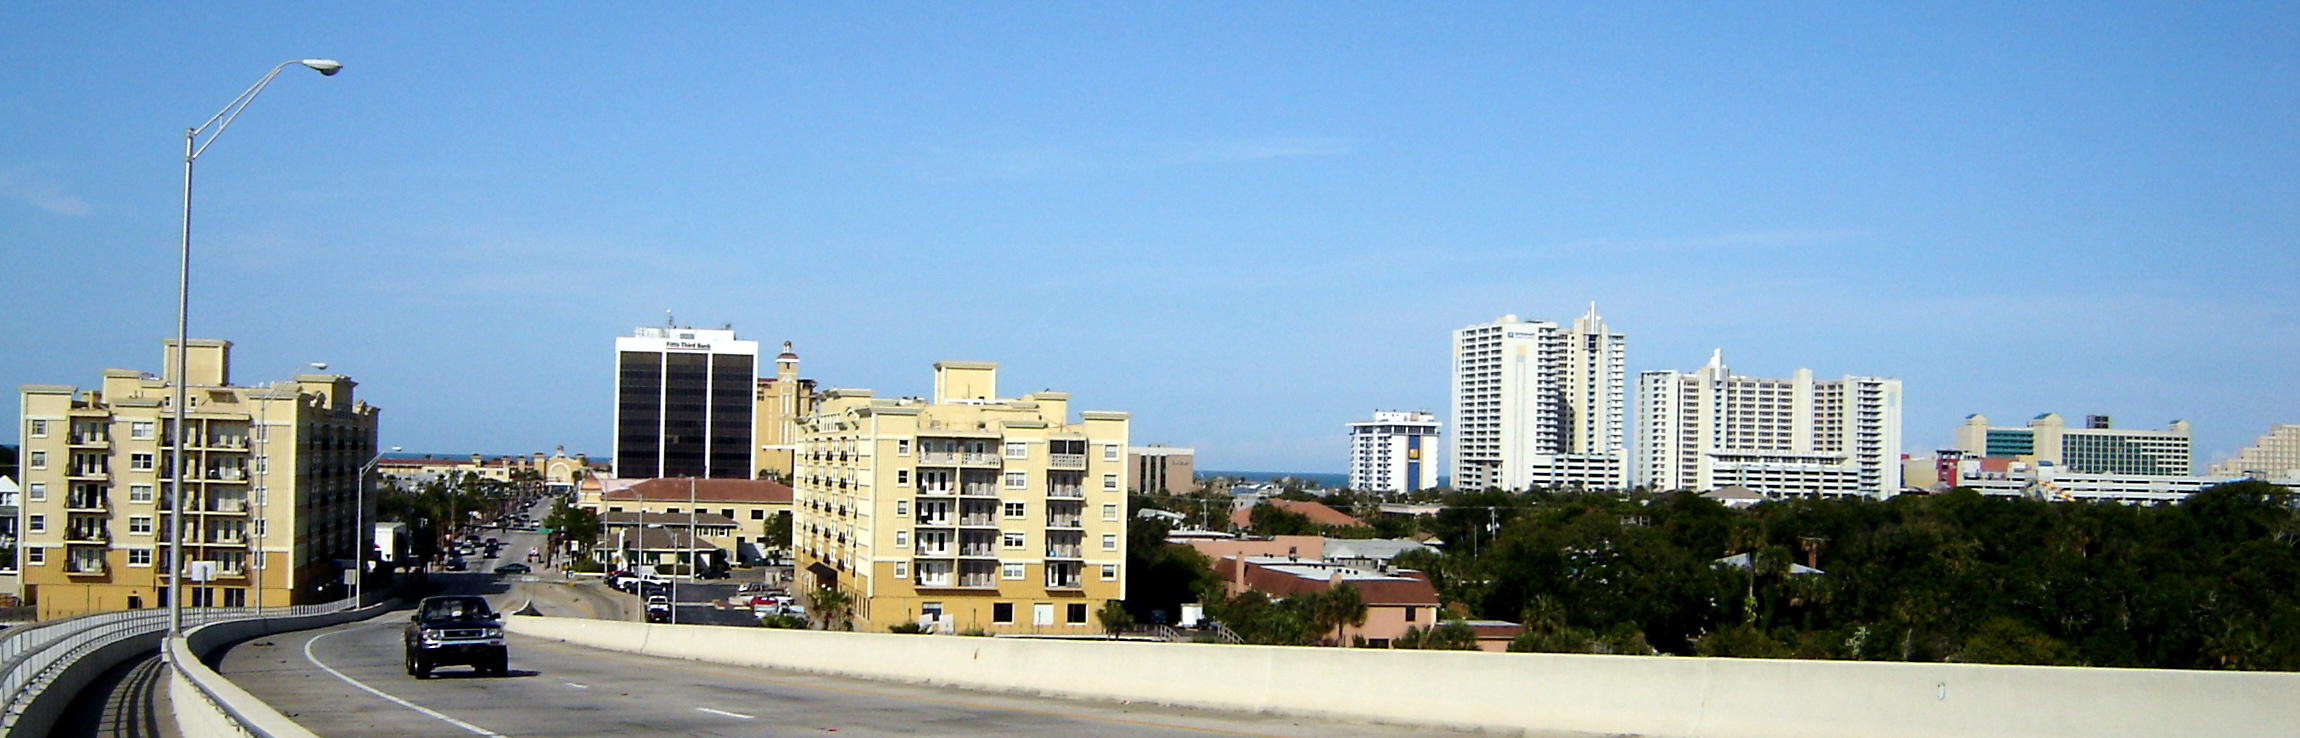 San Jose US City Skylines Ranked rates